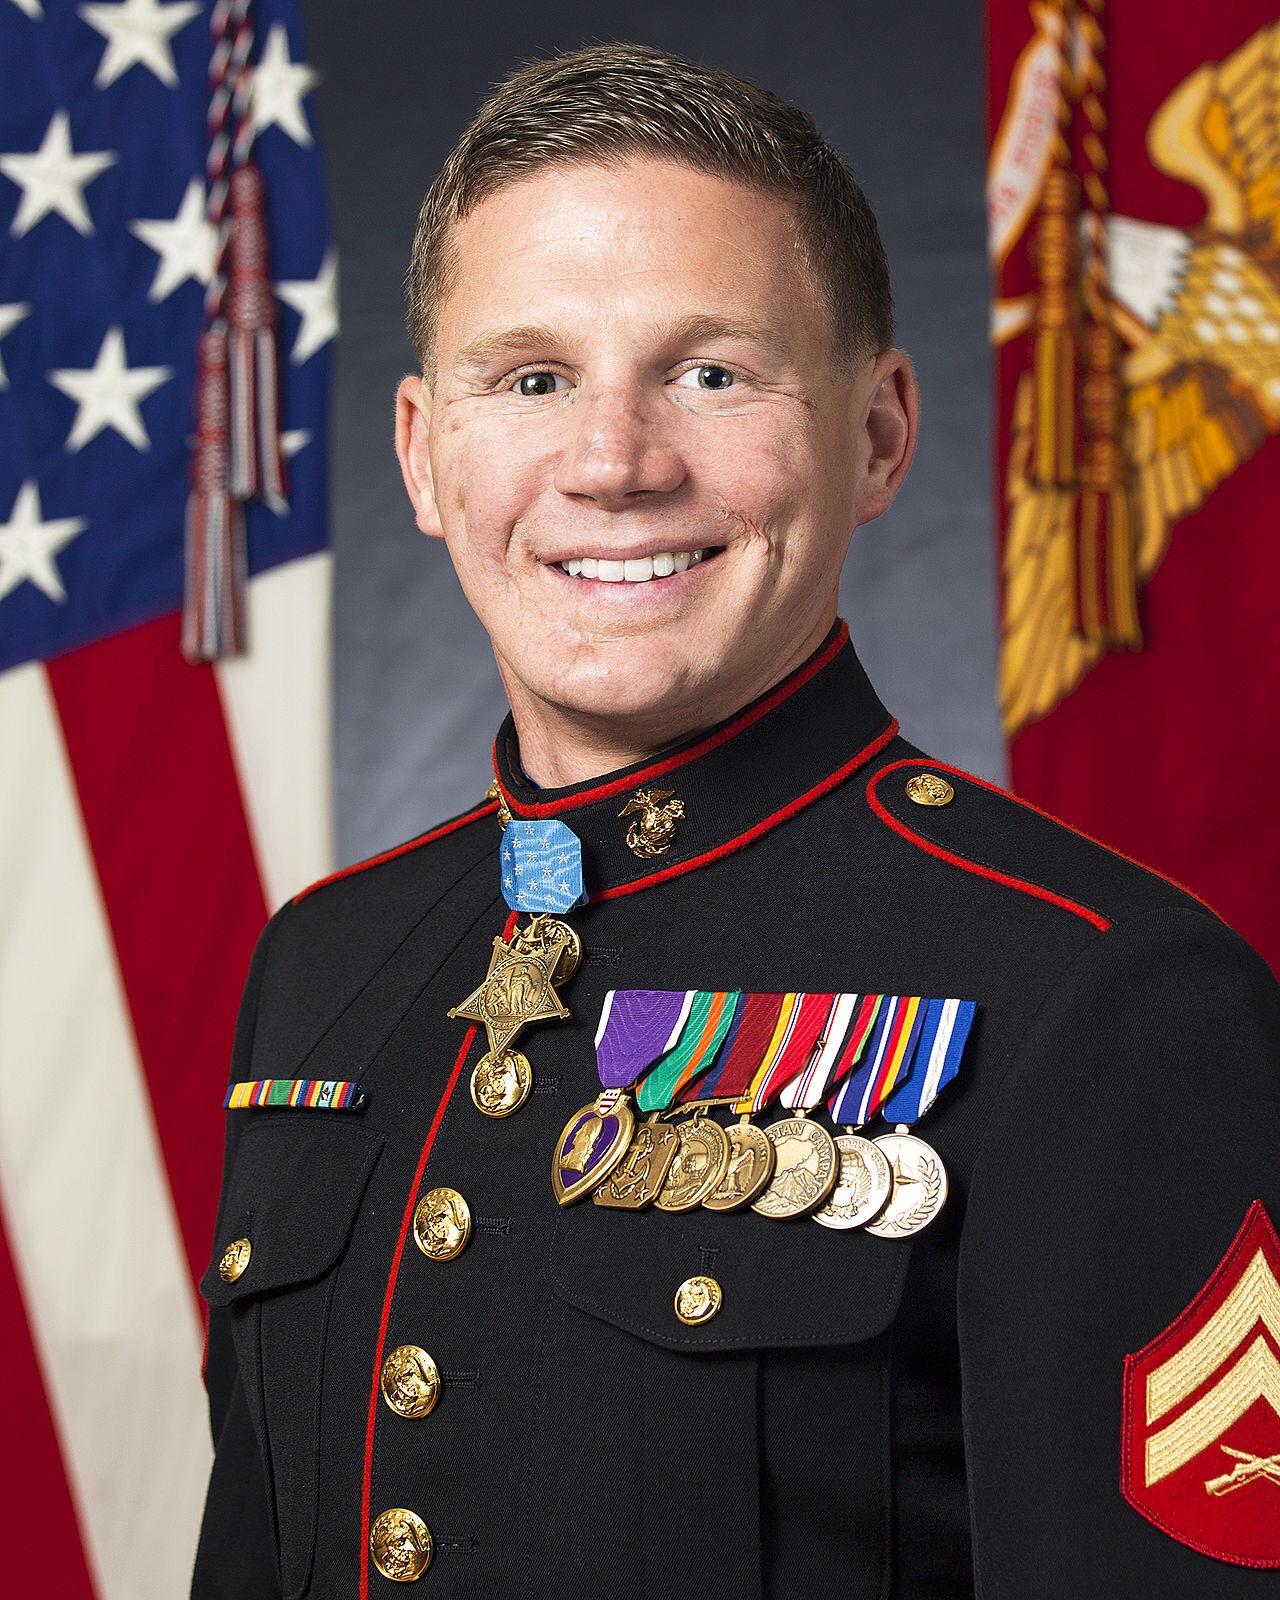 Medal of Honor recipient, Kyle Carpenter.